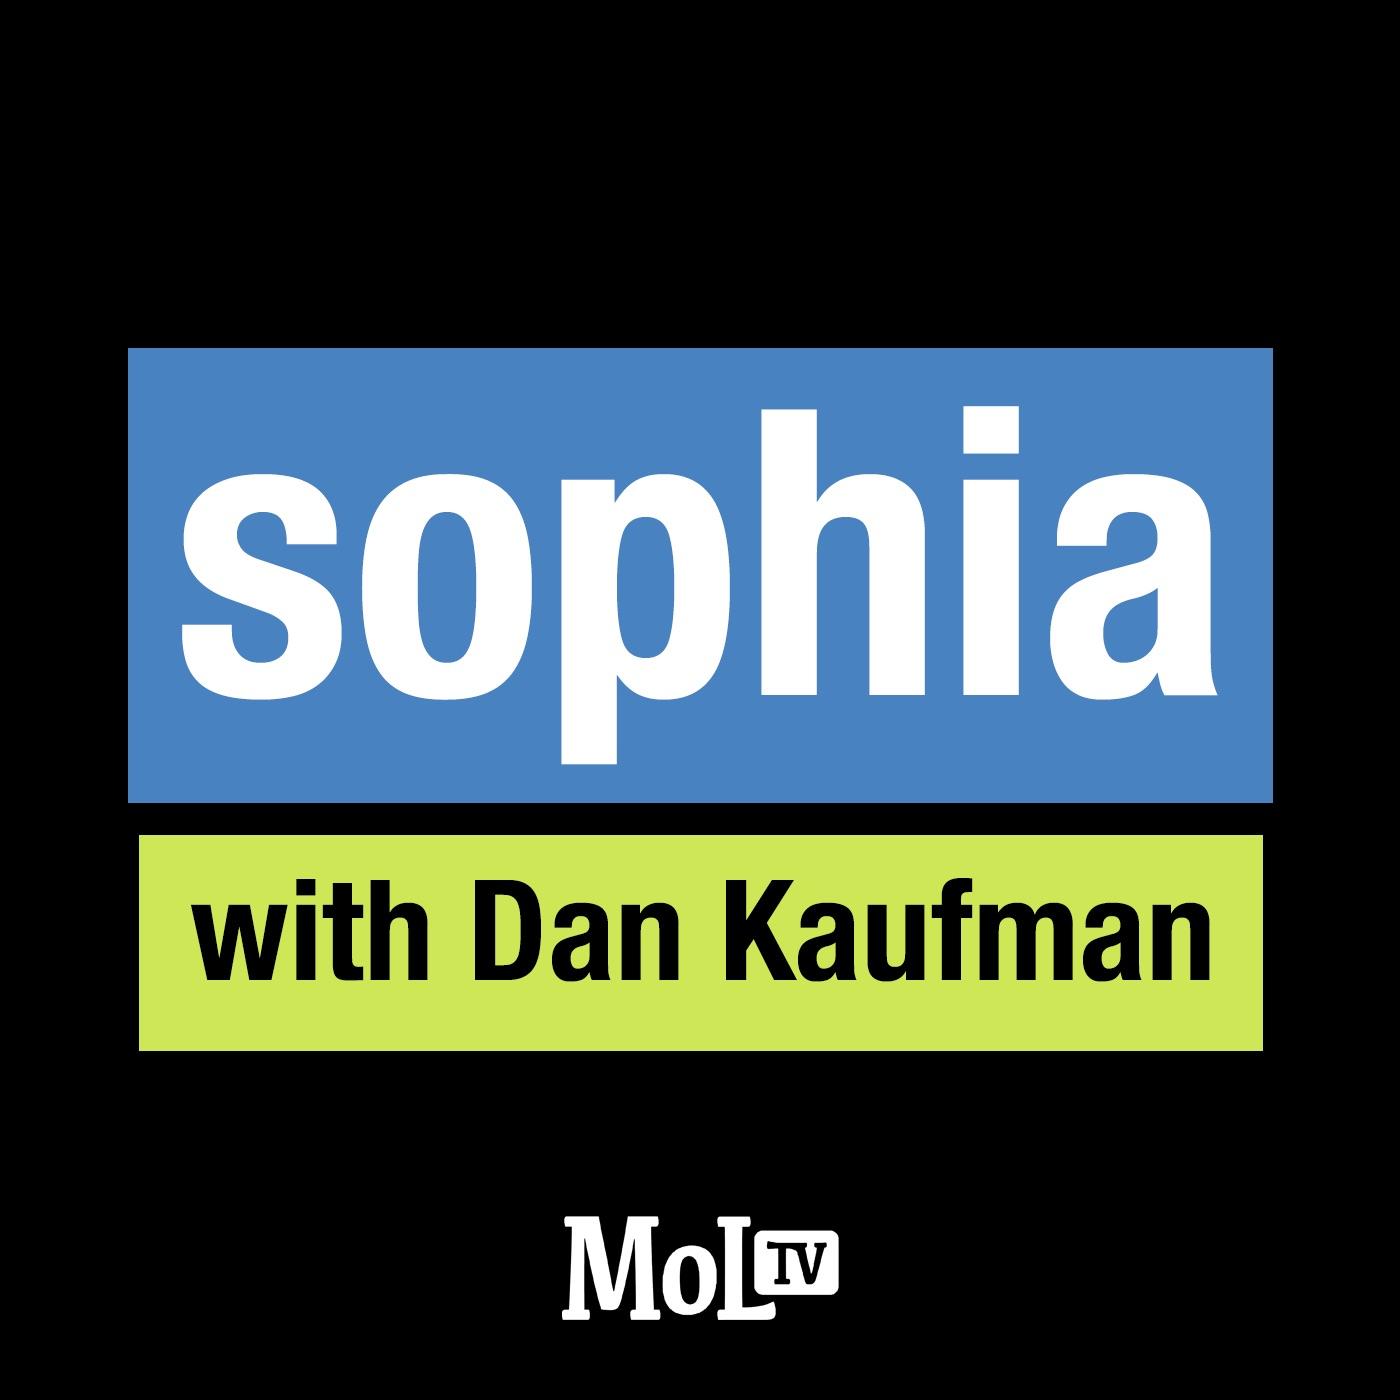 OLD MoLtv: Sophia